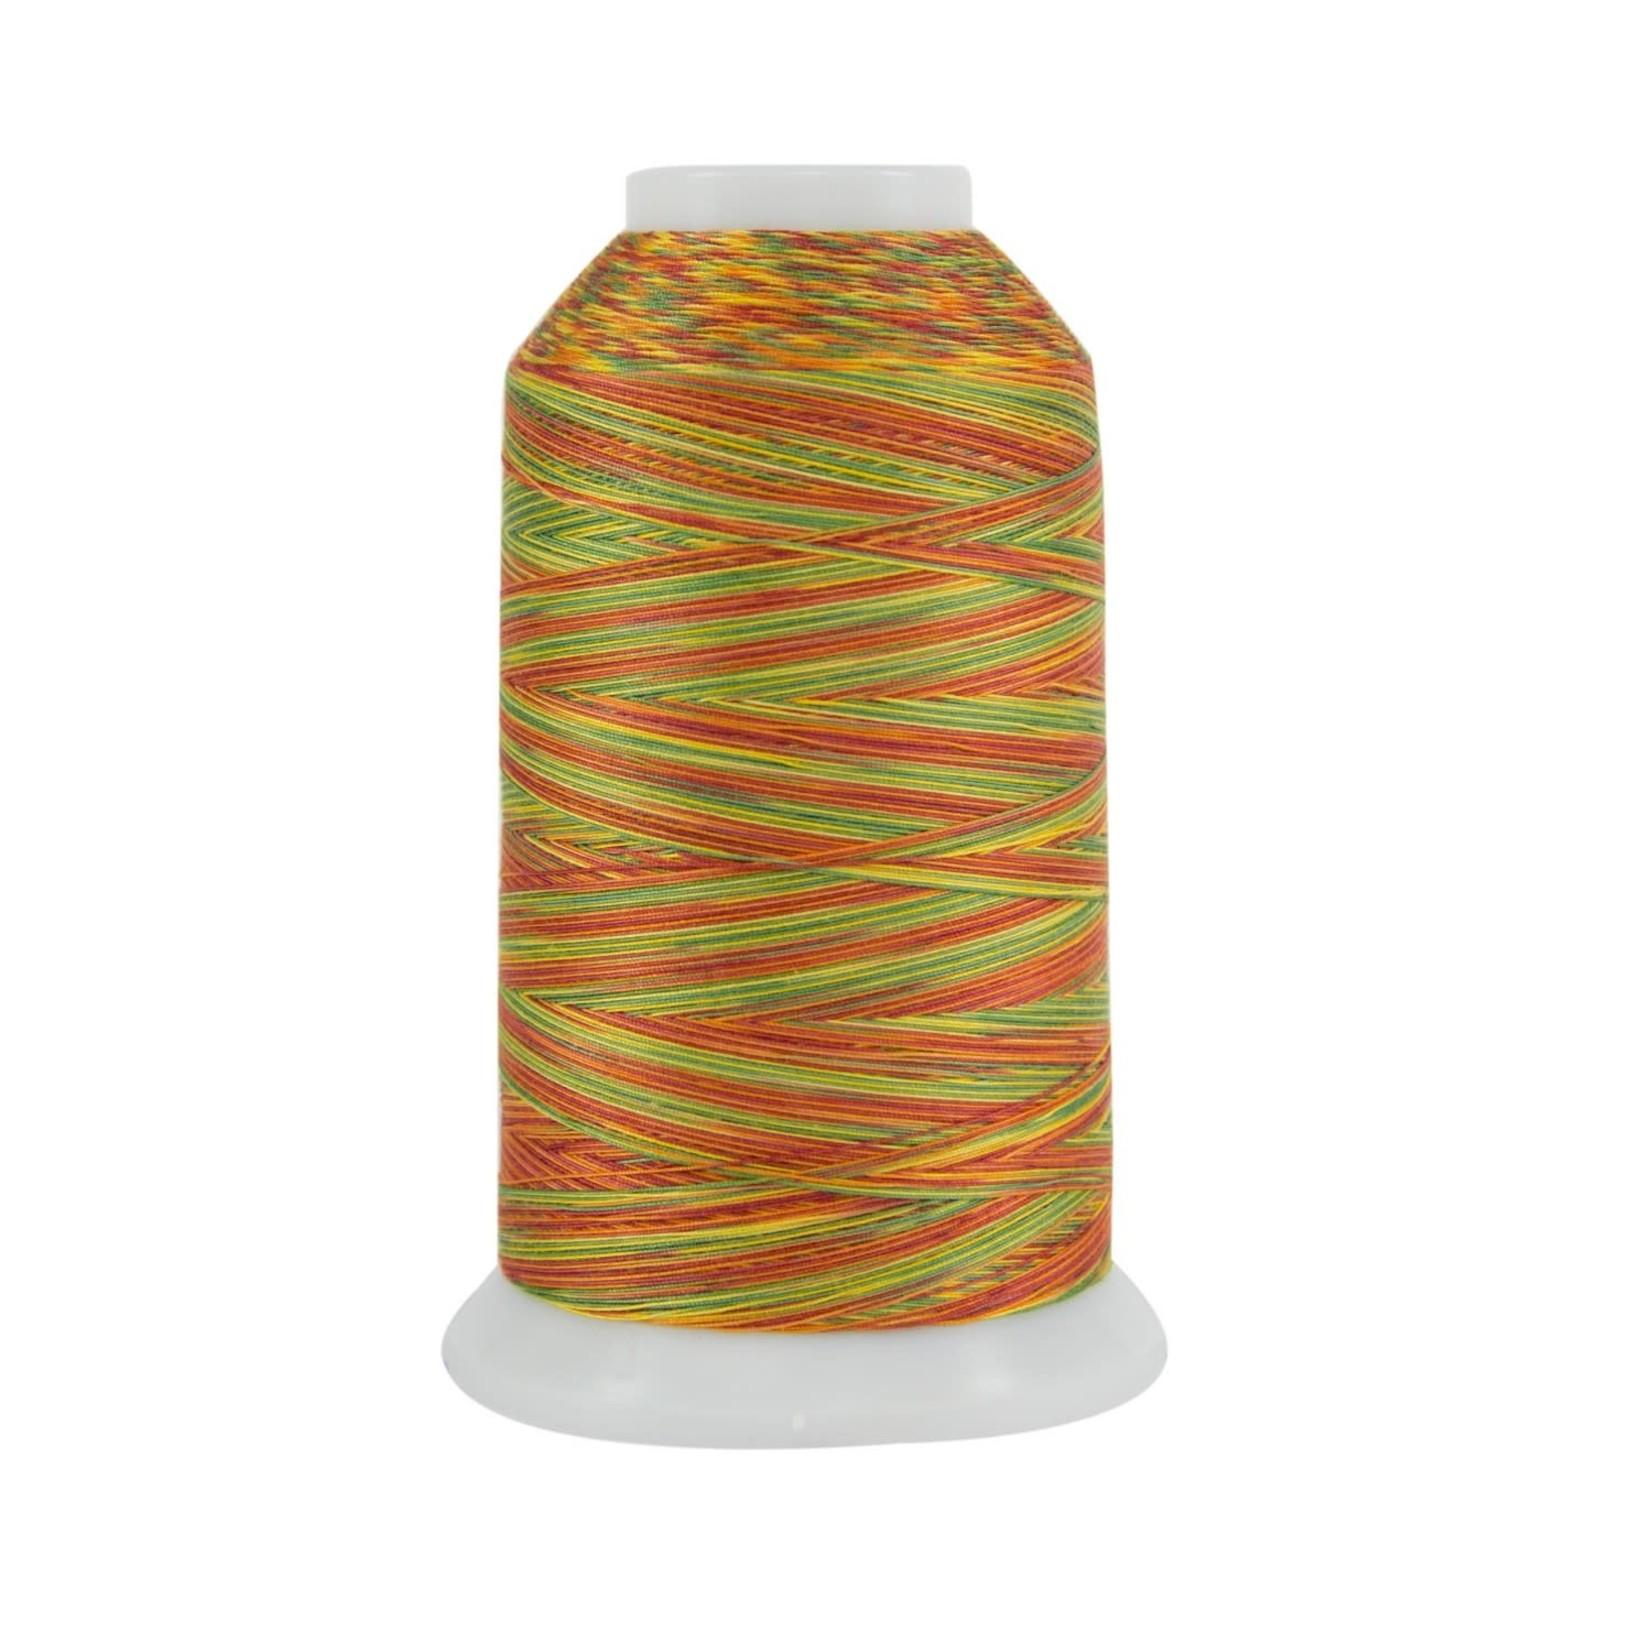 Superior Threads King Tut - #40 - 1828 m - 0906 Autumn Days